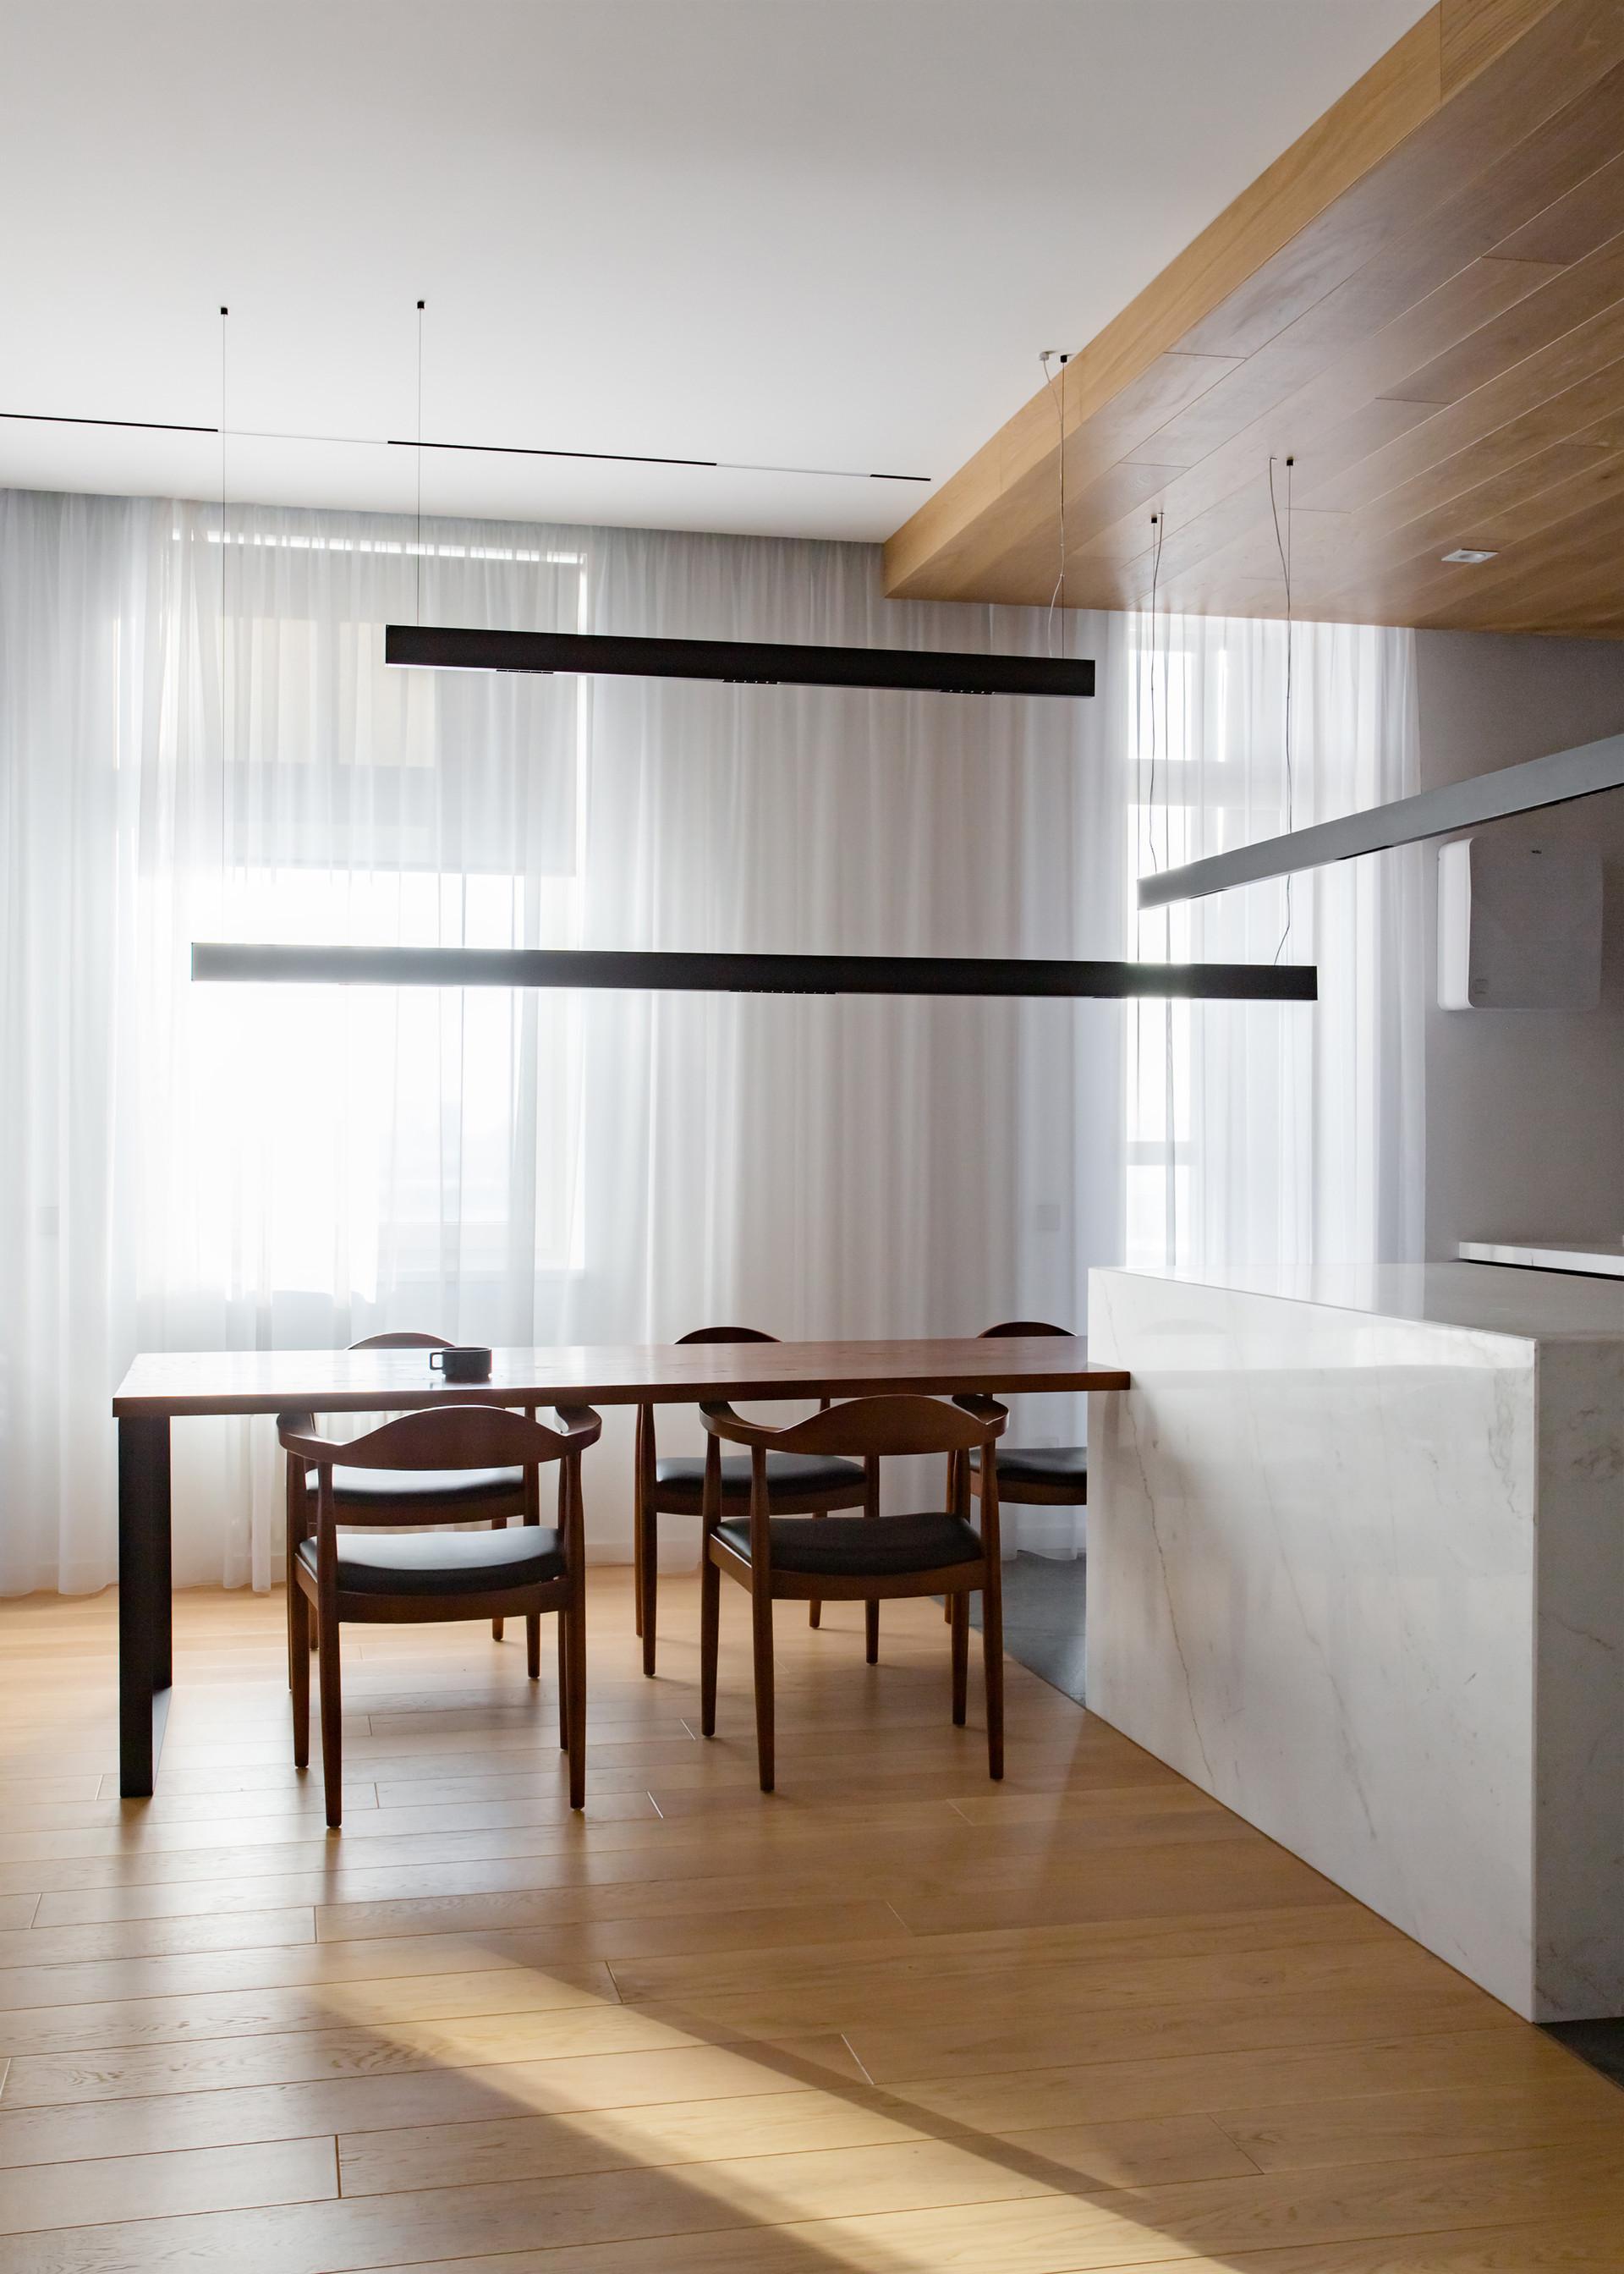 1Hdesign interior shubochkini architects sia8A9667-copy.jpg